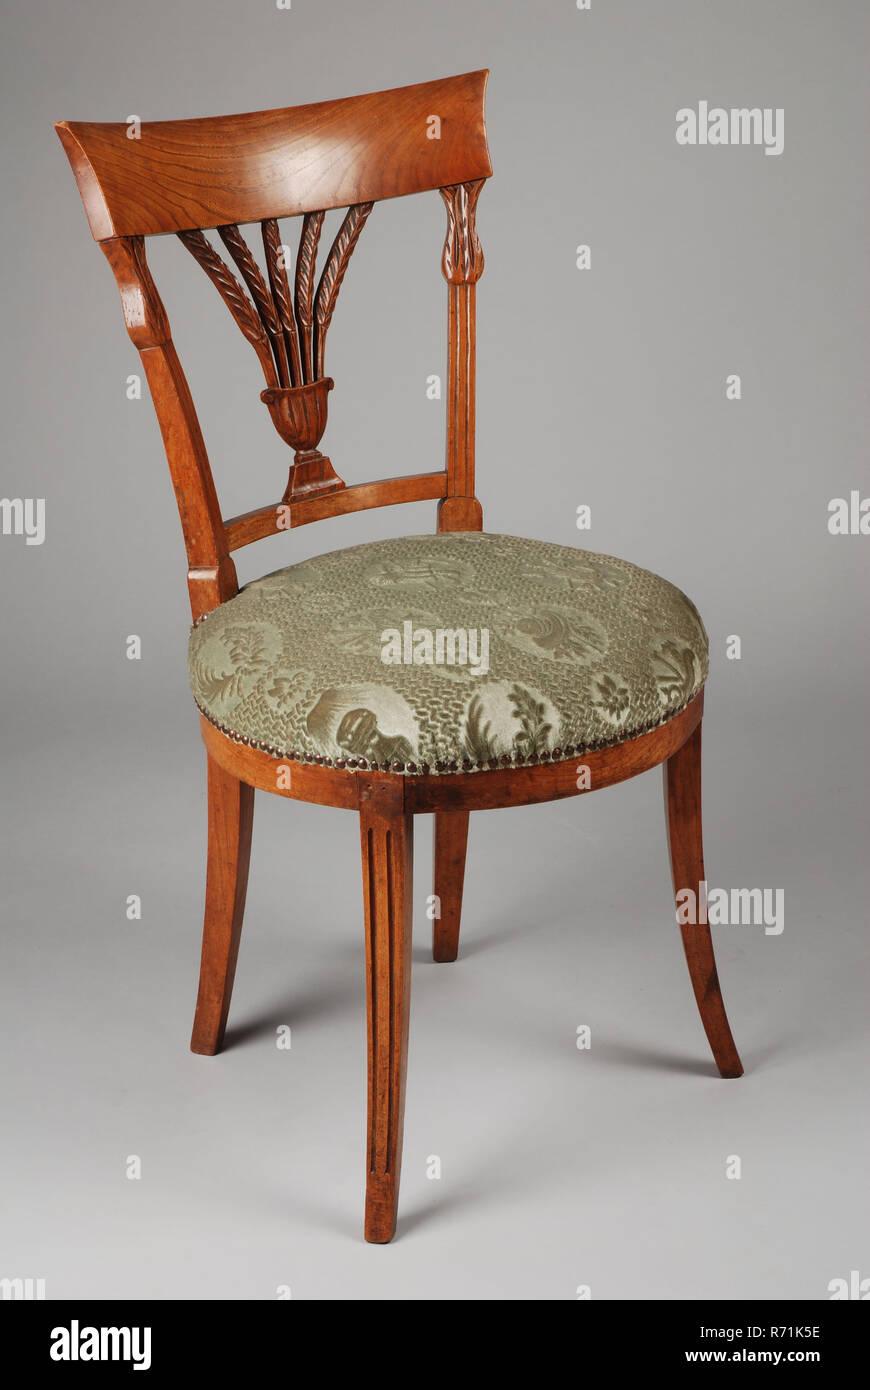 Egret Empire chair, chair furniture furniture interior design wood